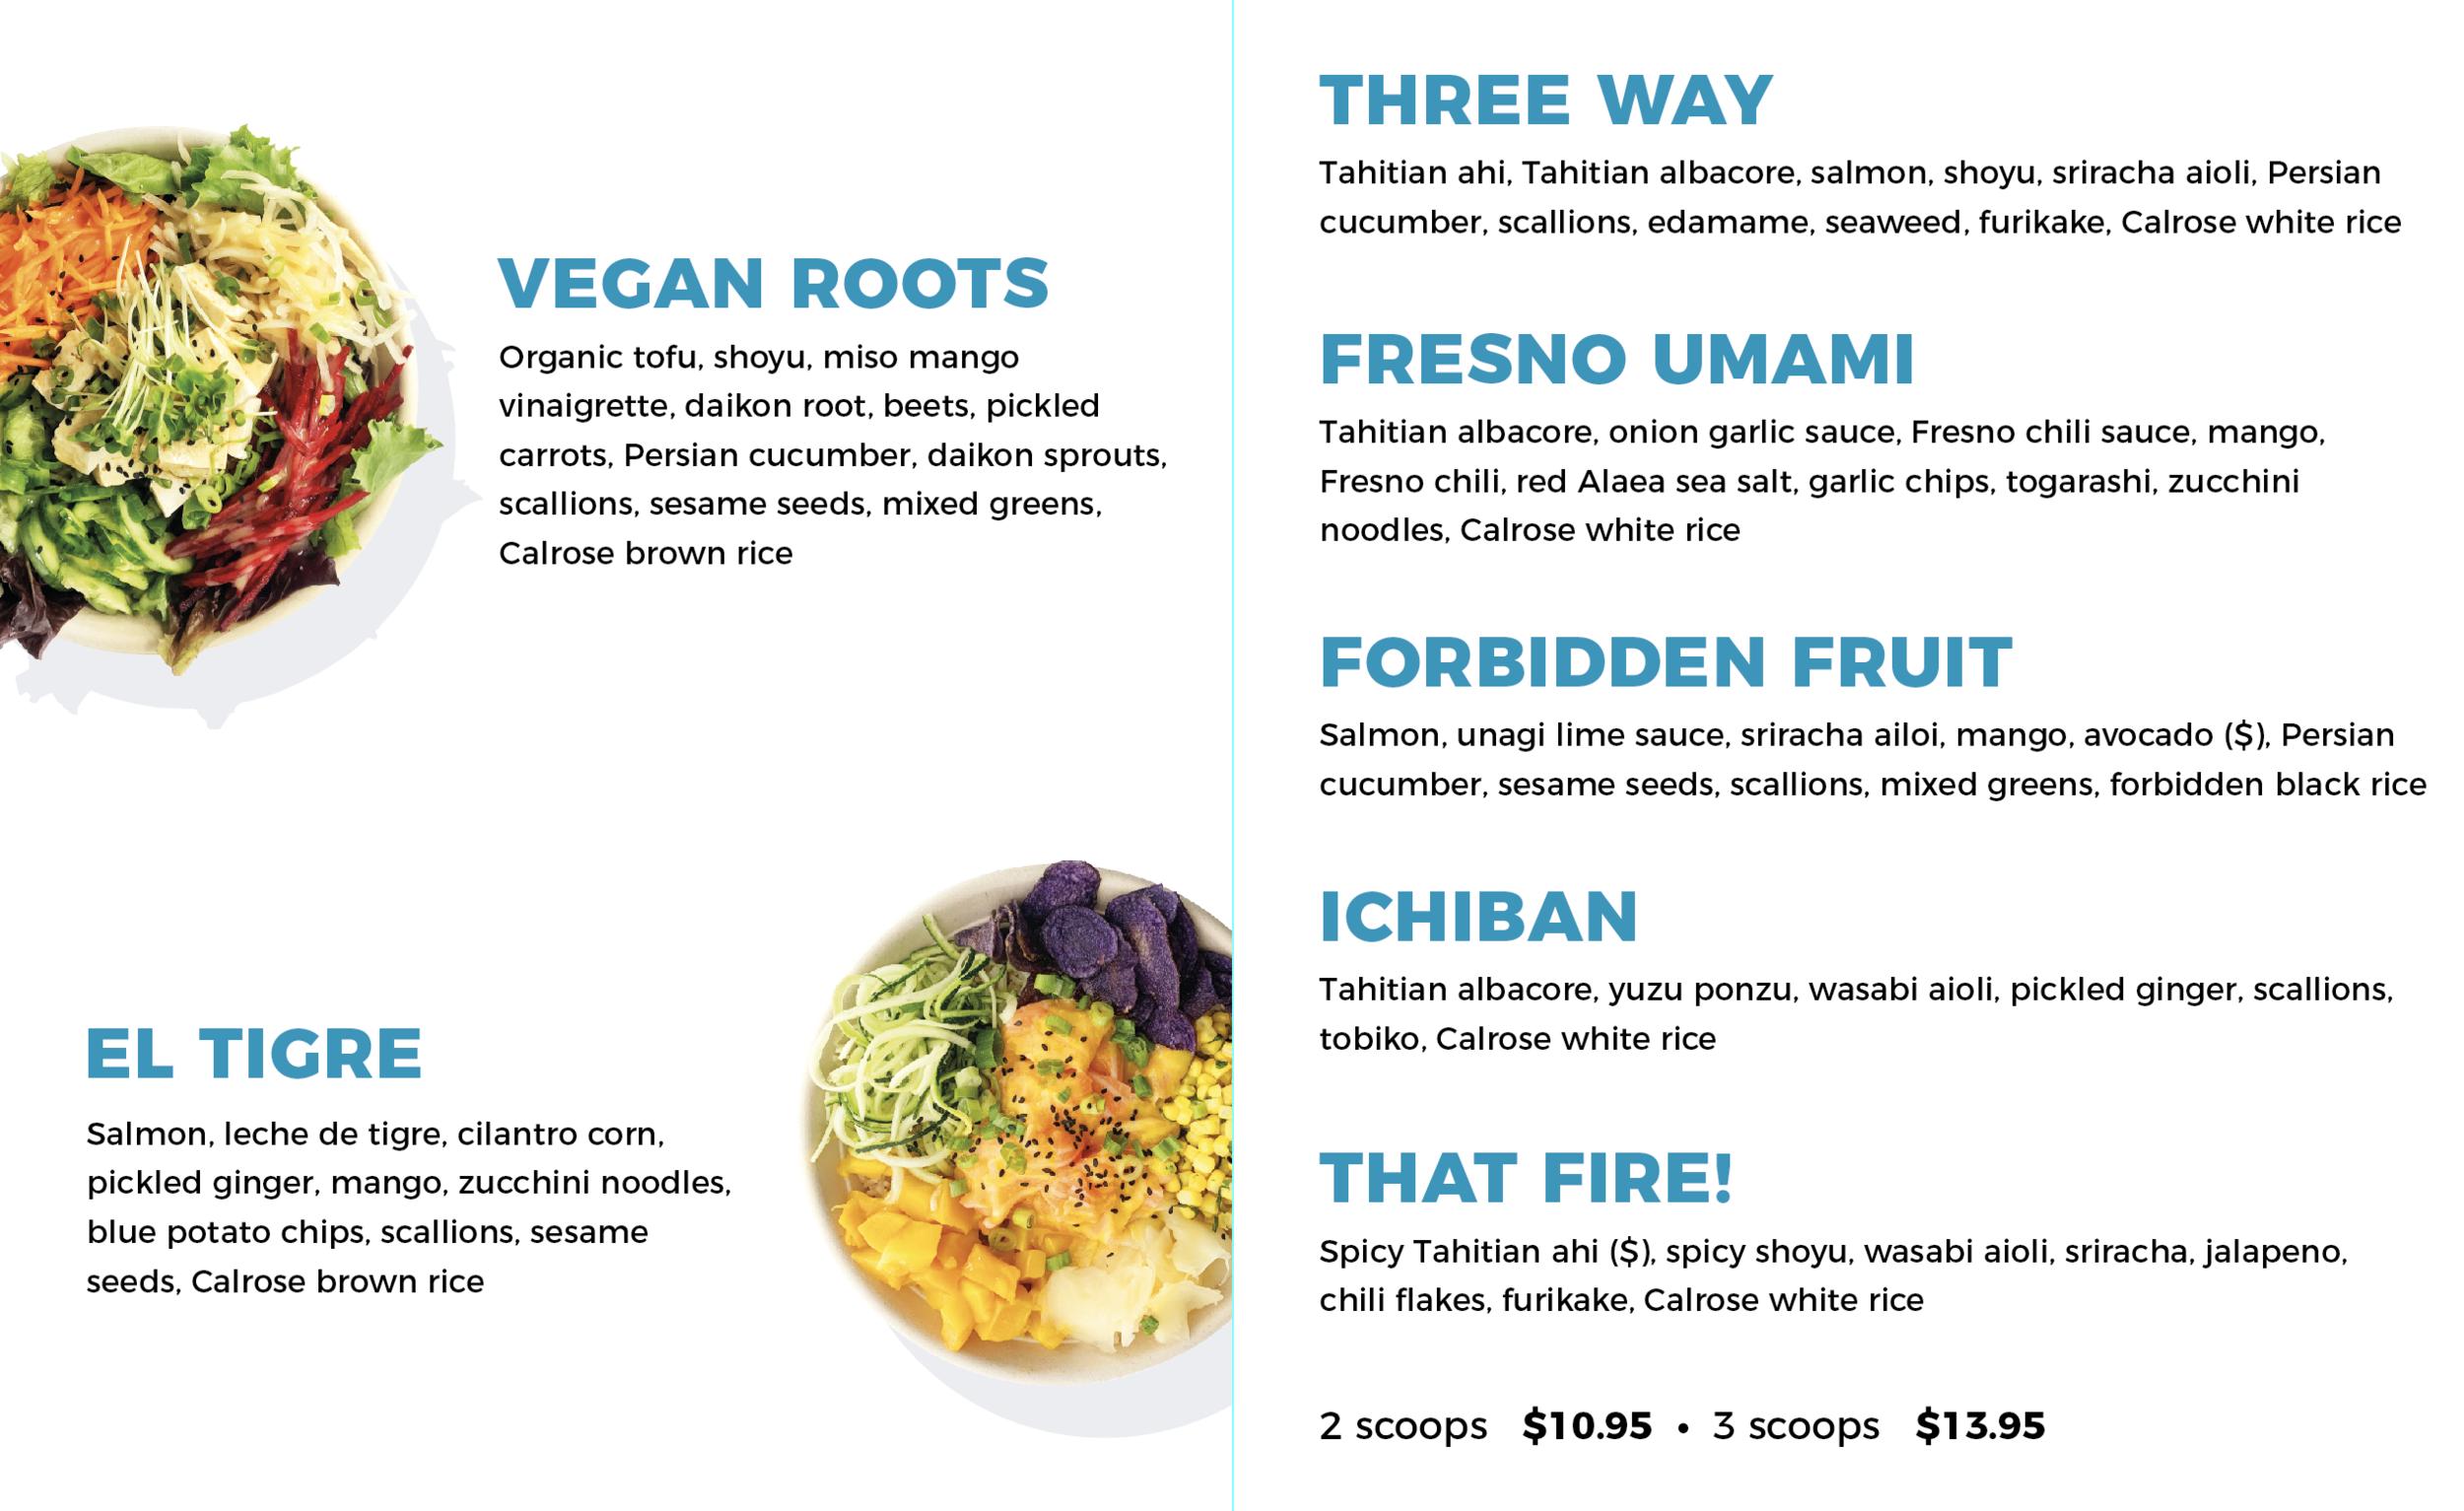 new menu options - Vegan Roots, El Tigre, Three Way, Fresno Umami, Forbidden Fruit, Ichiban, That Fire!